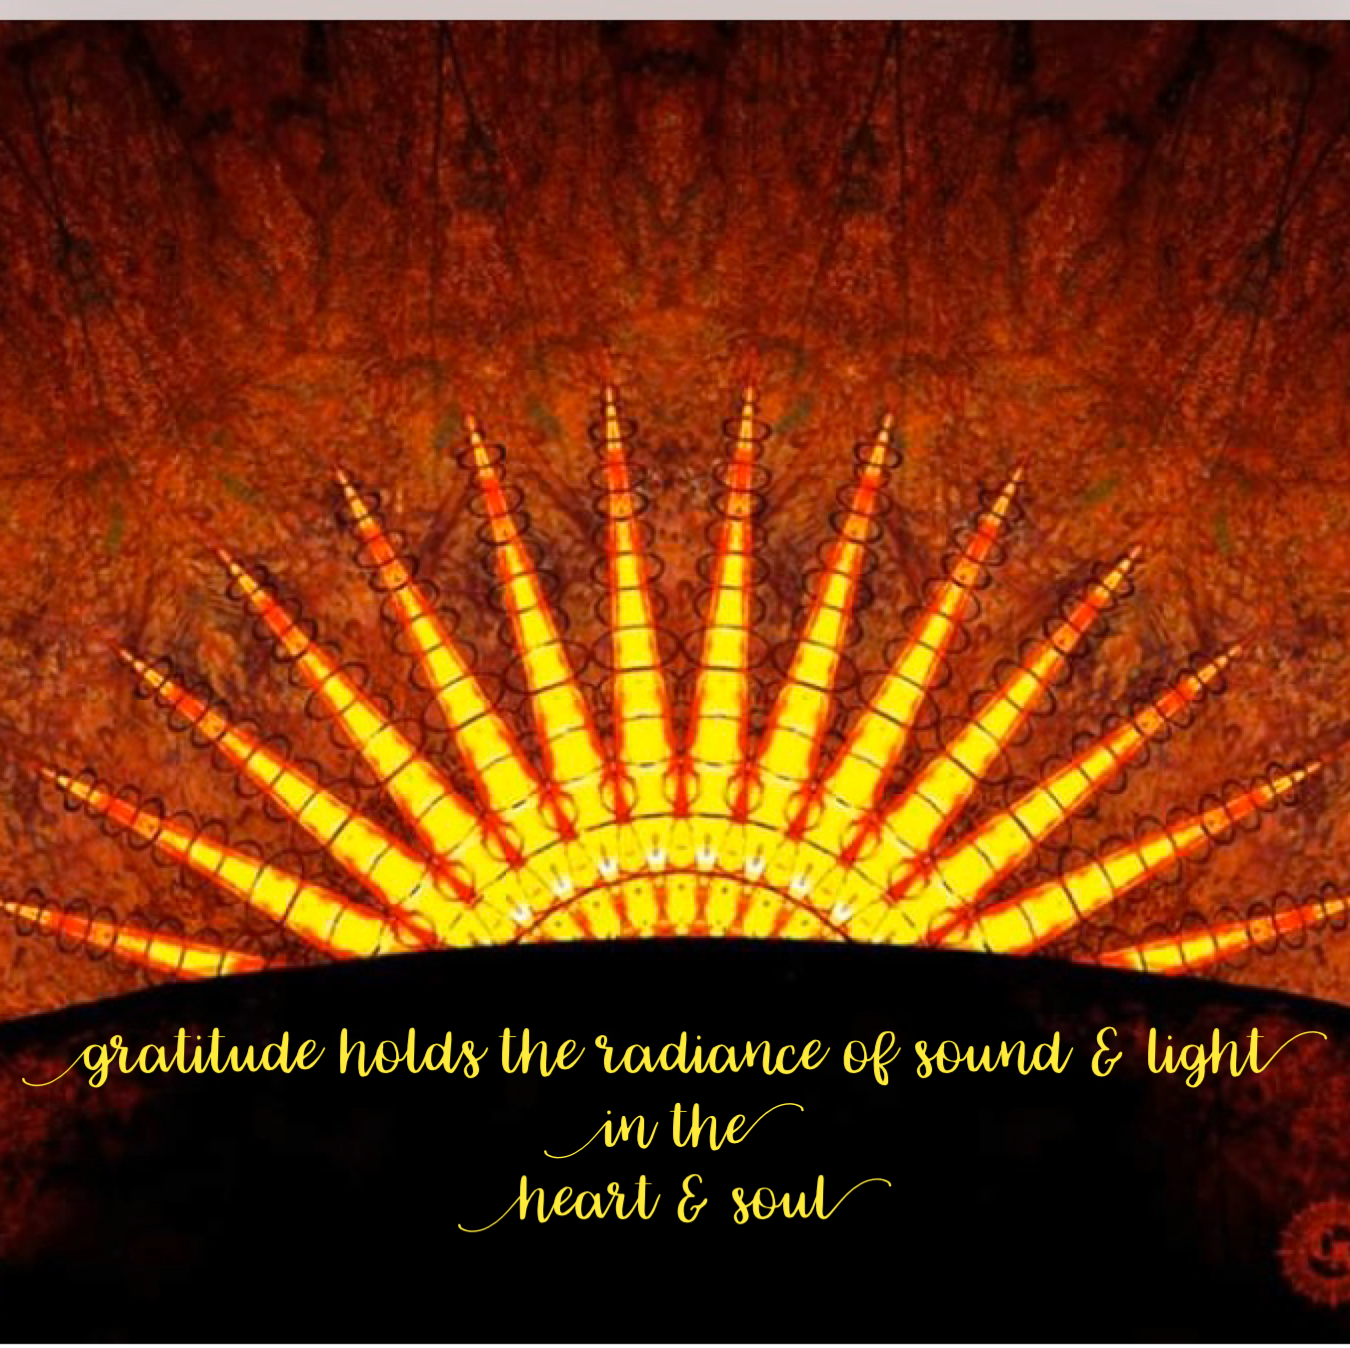 The Sound of Gratitude Sound Healing